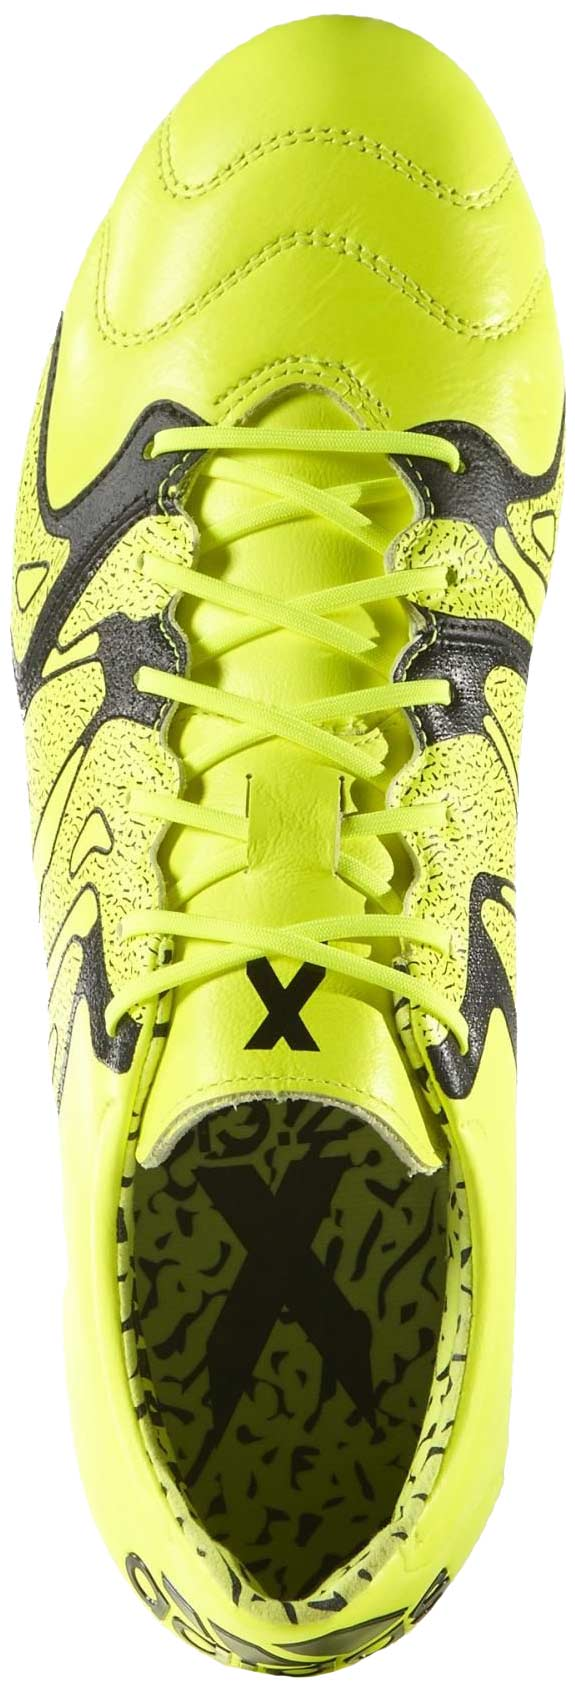 adidas X 15.2 FG-AG LEATHER | sportisimo.cz